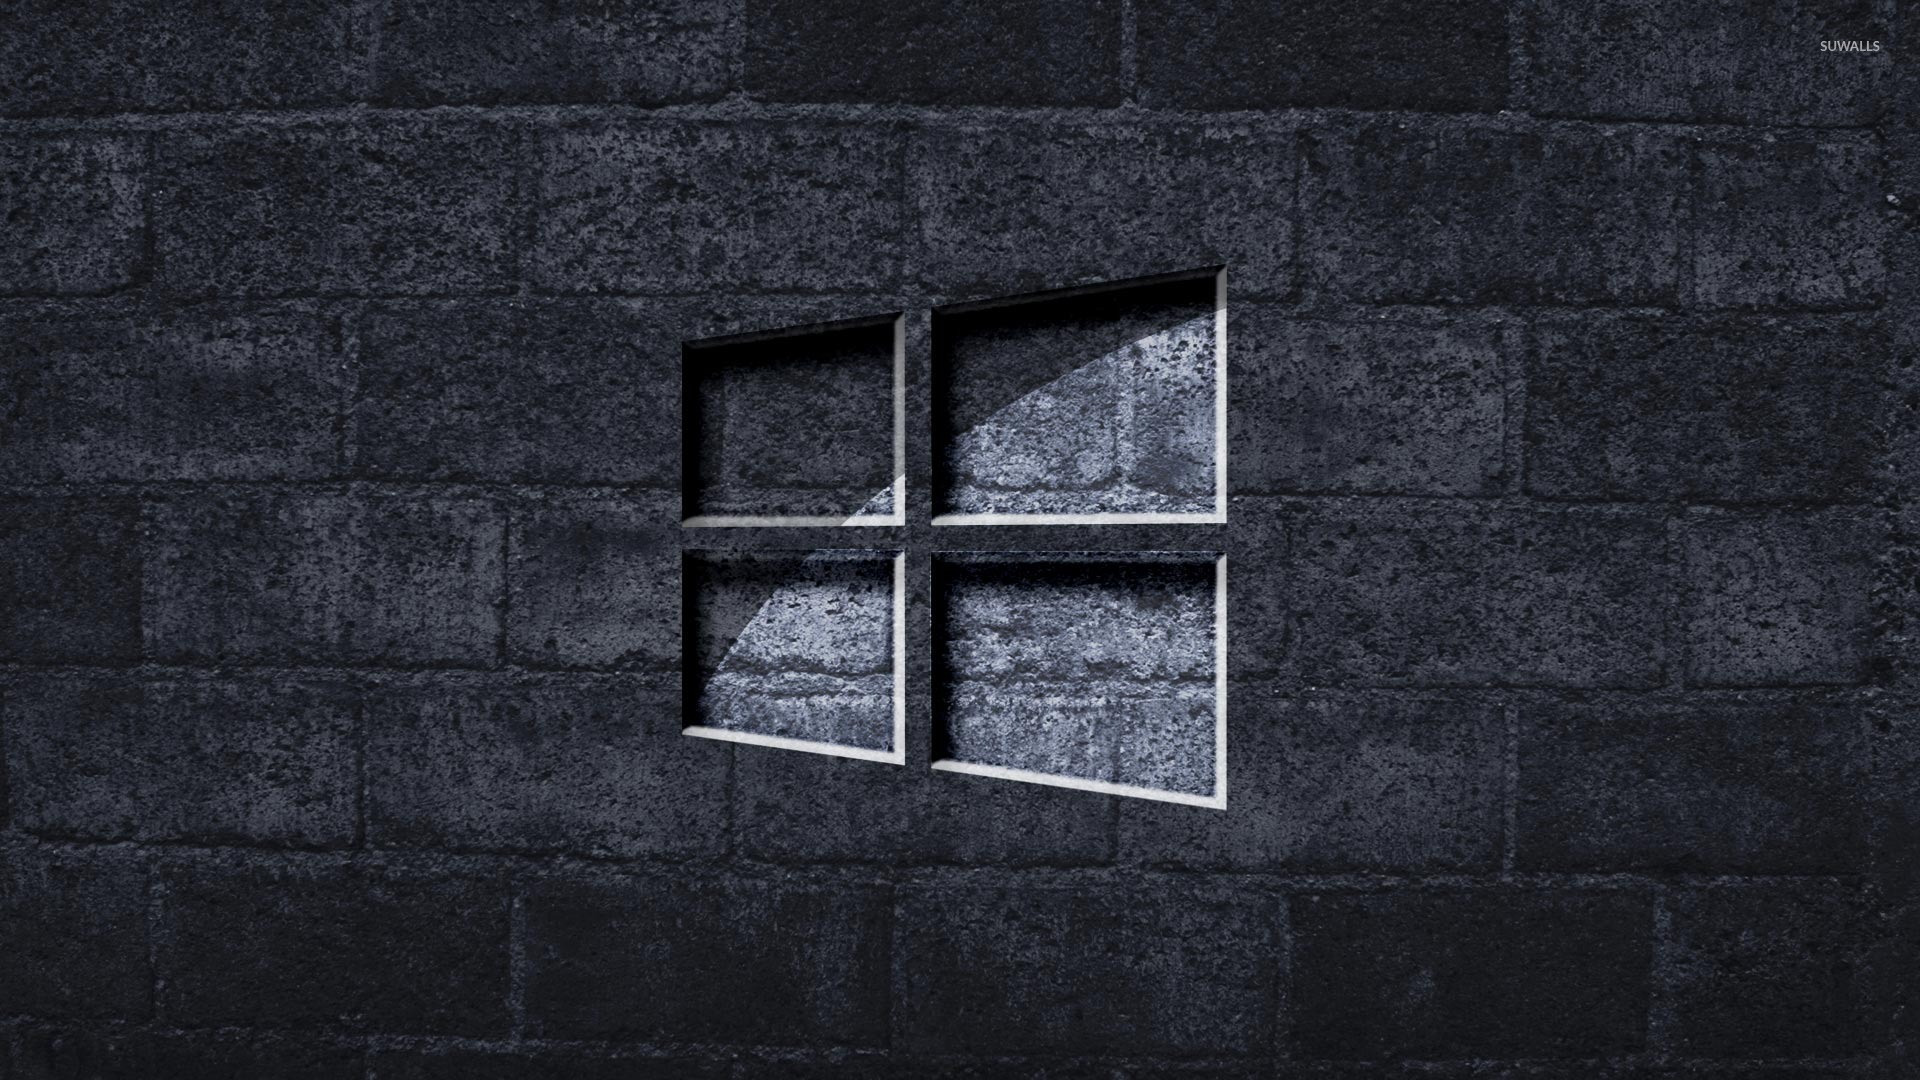 Windows 10 River Wallpaper